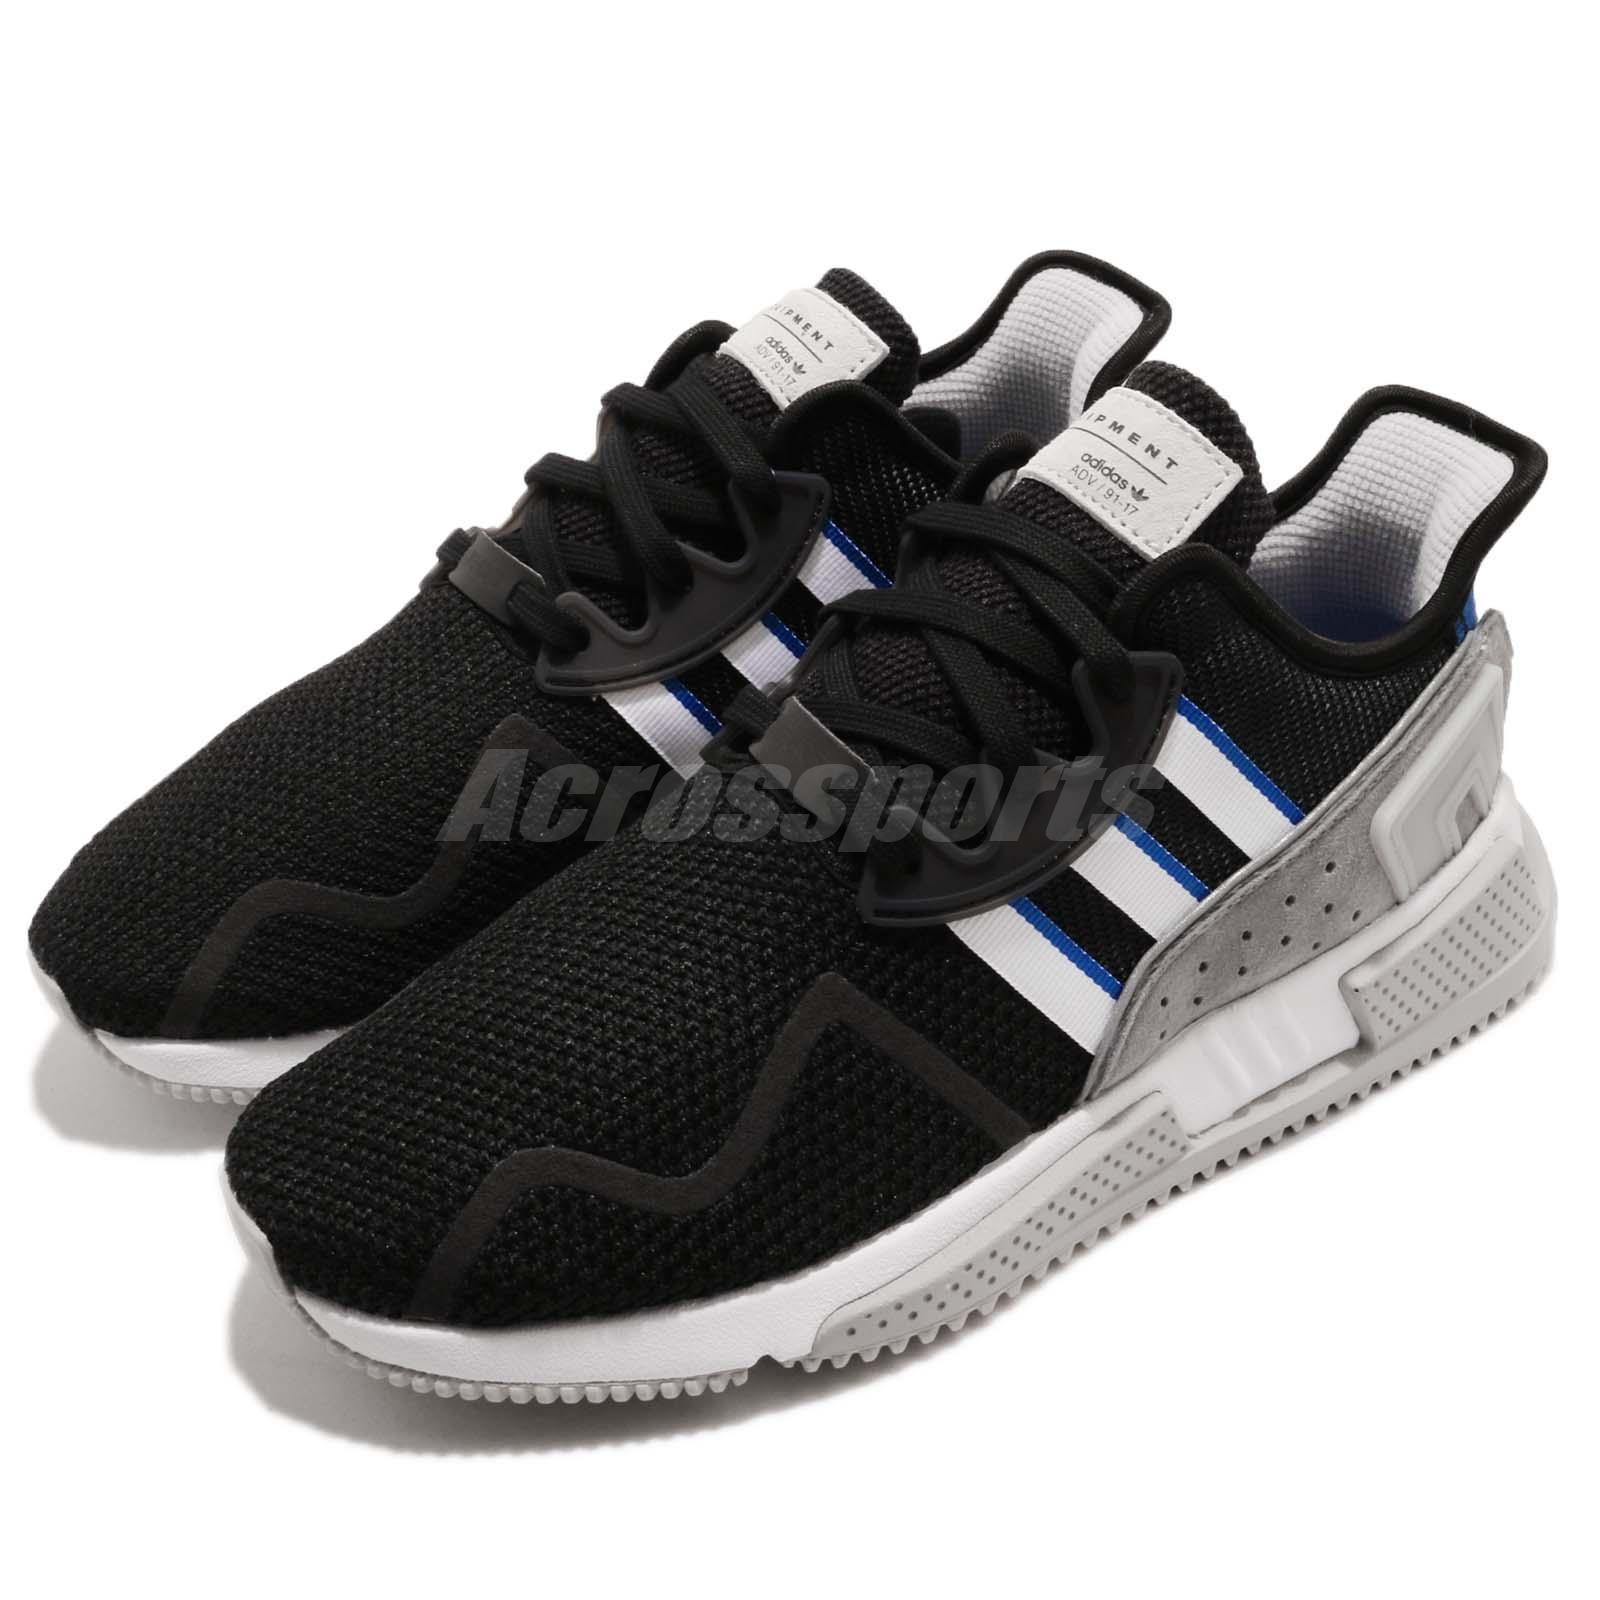 5640124a5f45 Details about adidas Originals EQT Cushion ADV Black Grey Blue Men Running  Shoe Sneaker BB7177